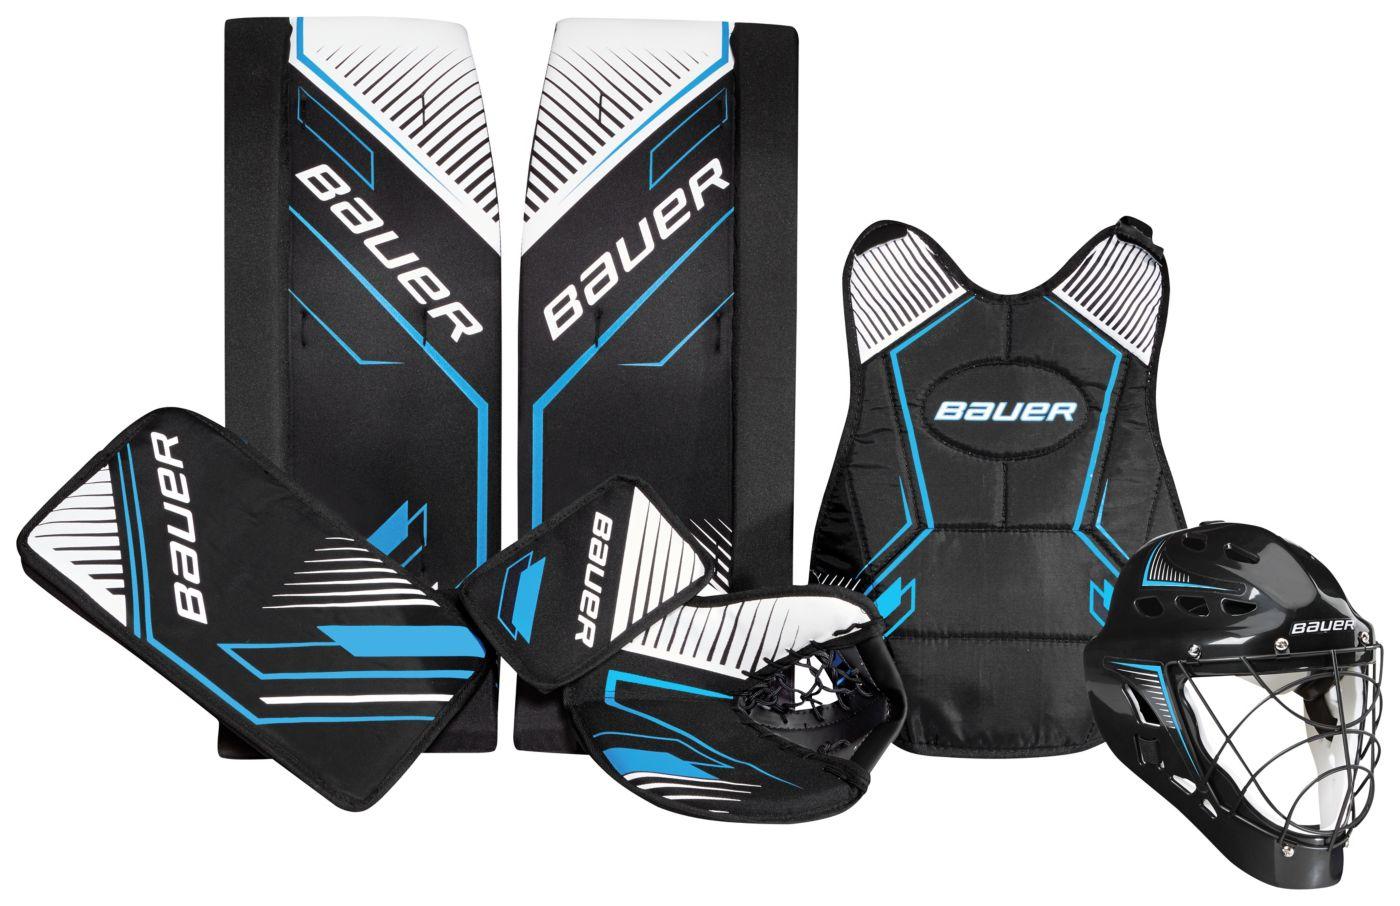 Bauer Youth Recreational Street Hockey Goalie Kit